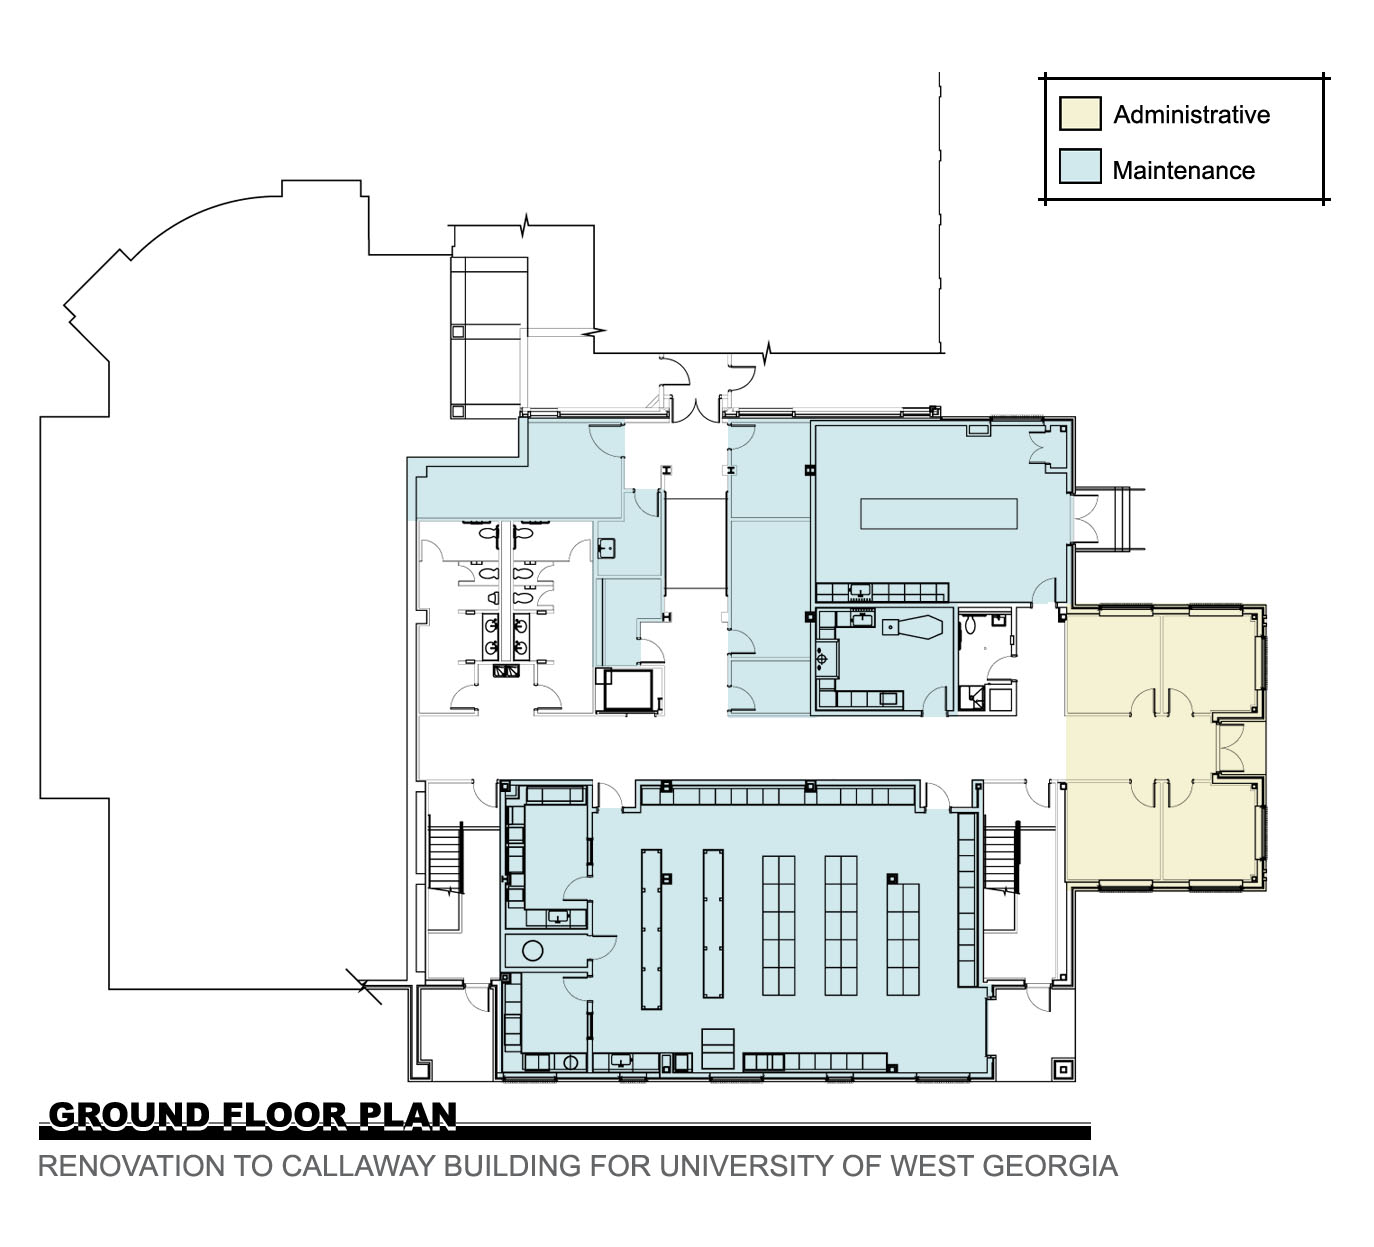 Callaway - Ground Floor COPY Model (1) copy.jpg